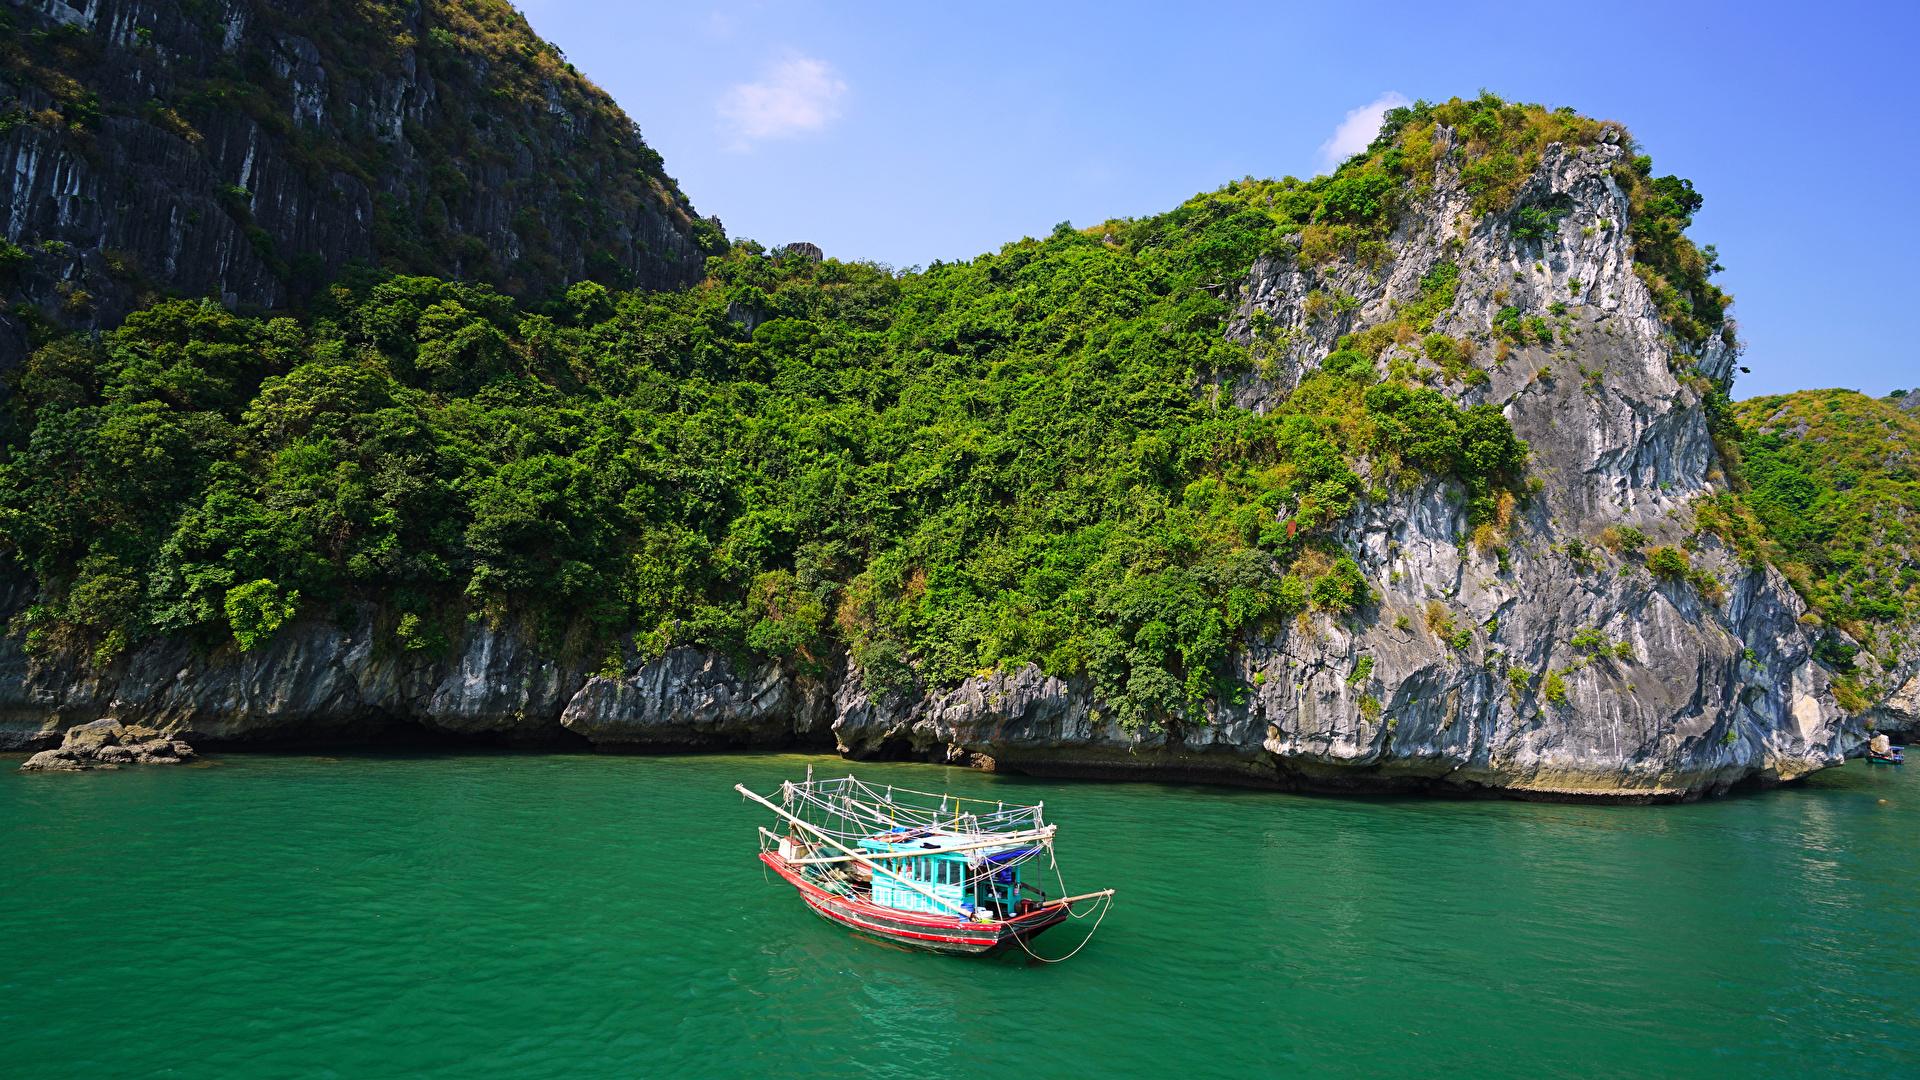 Картинка Вьетнам Lan Ha Bay Скала Природа корабль заливы Катера 1920x1080 Утес скалы скале Корабли Залив залива